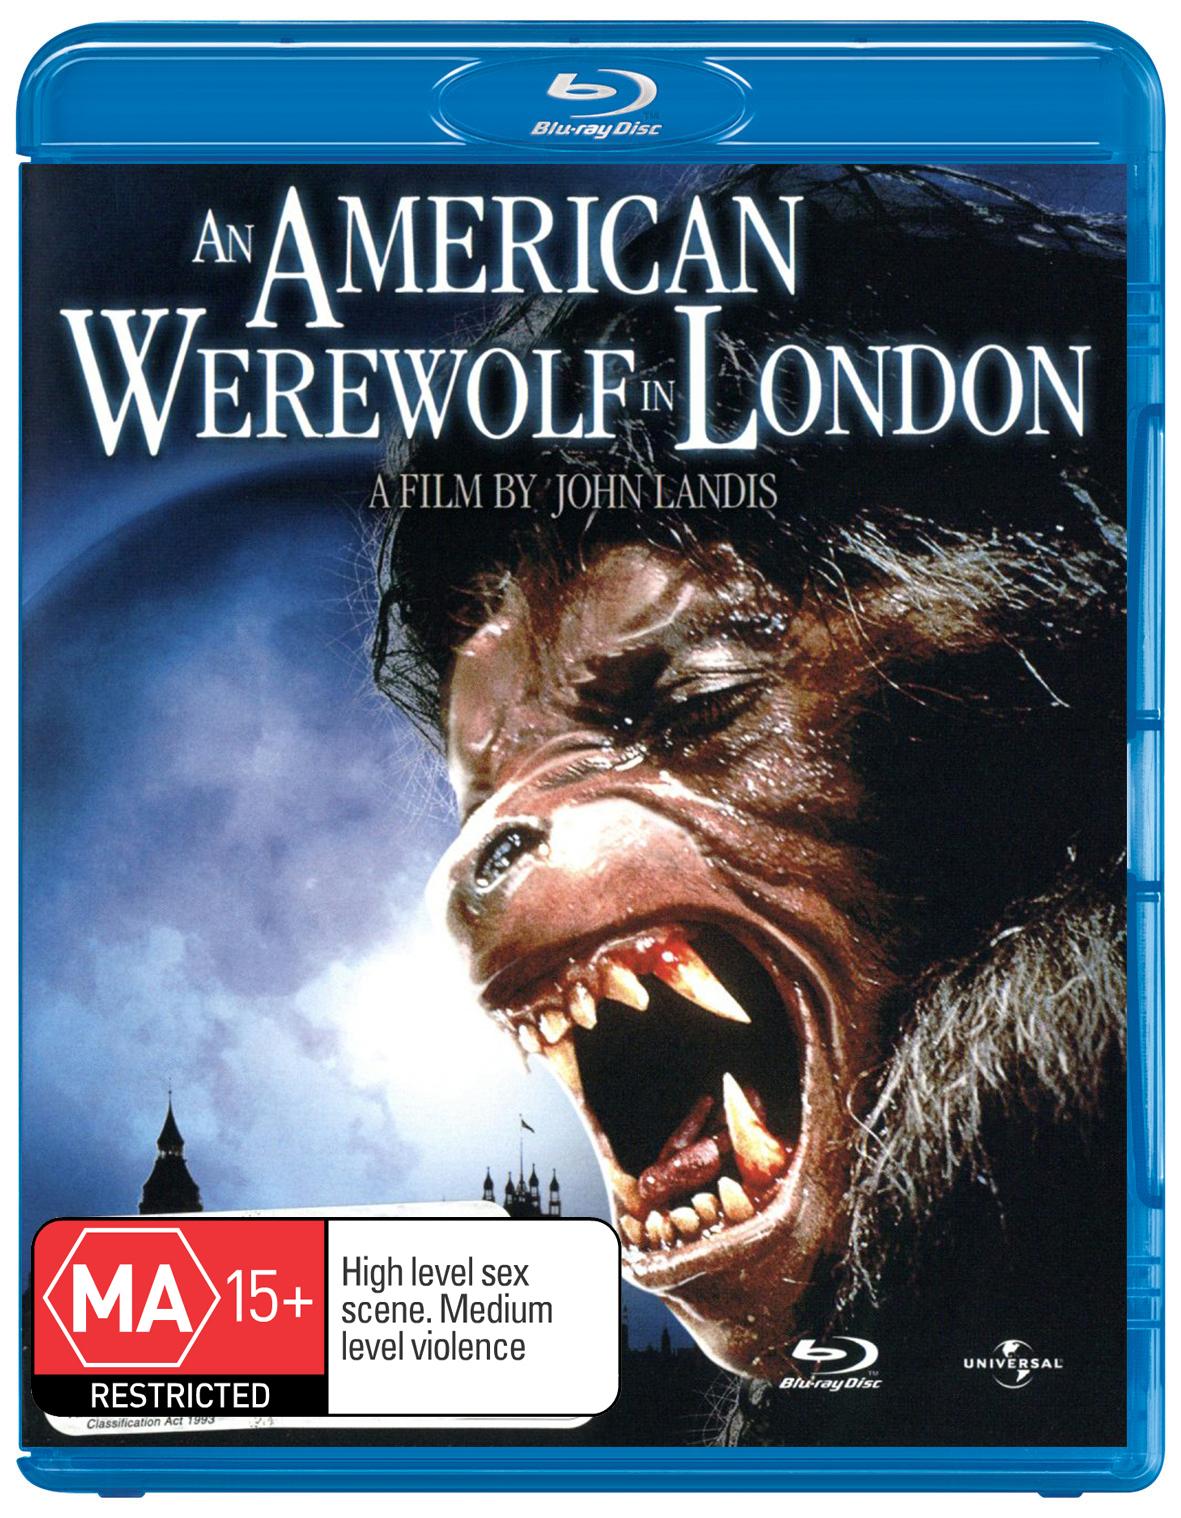 An American Werewolf in London on Blu-ray image